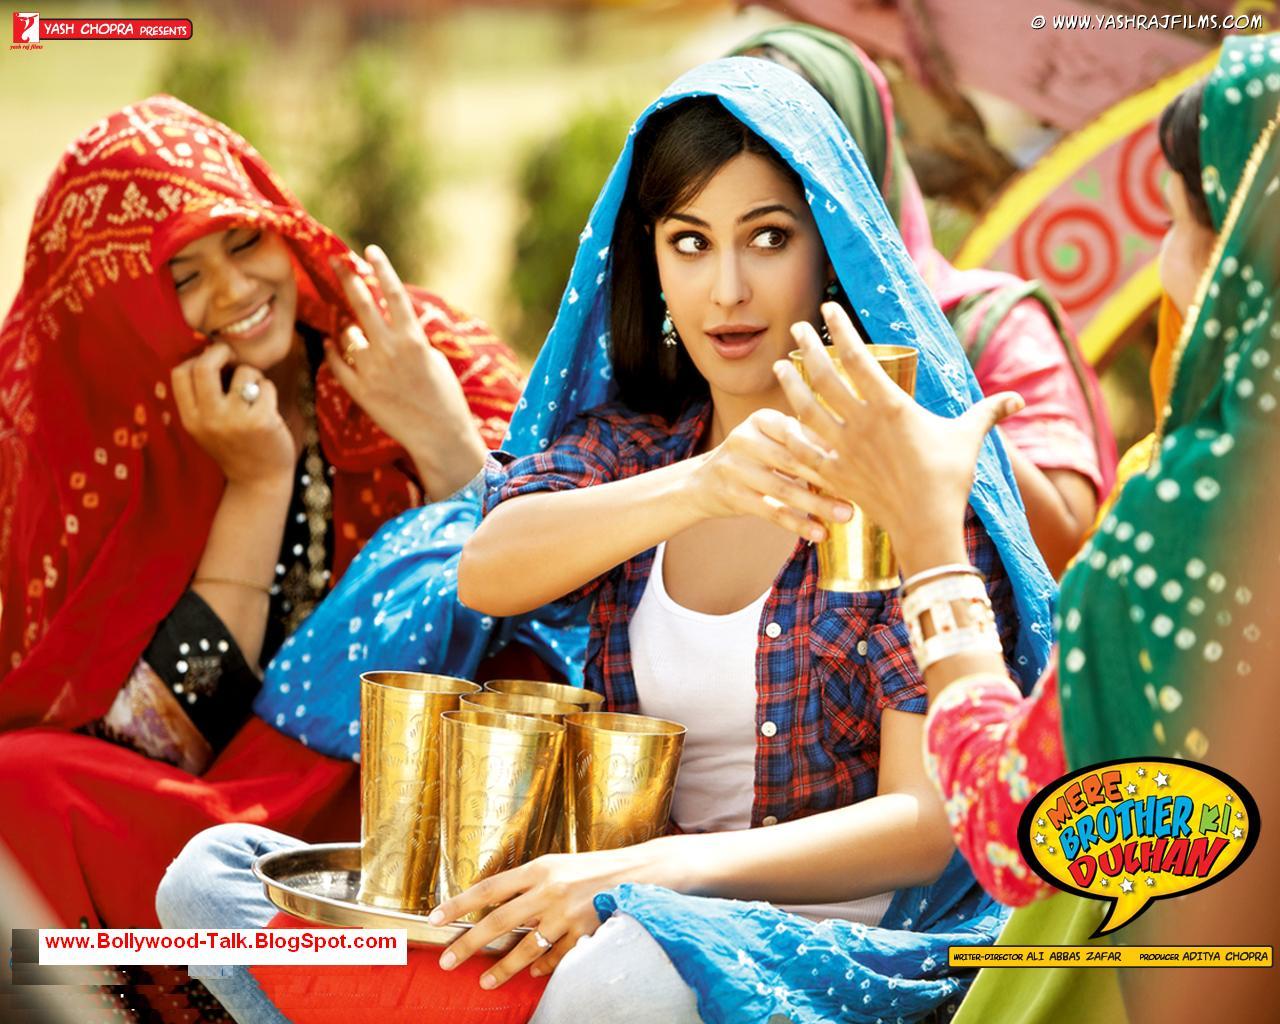 Katrina Kaif In Mere Brother Ki Dulhan  Hot Wallpapers